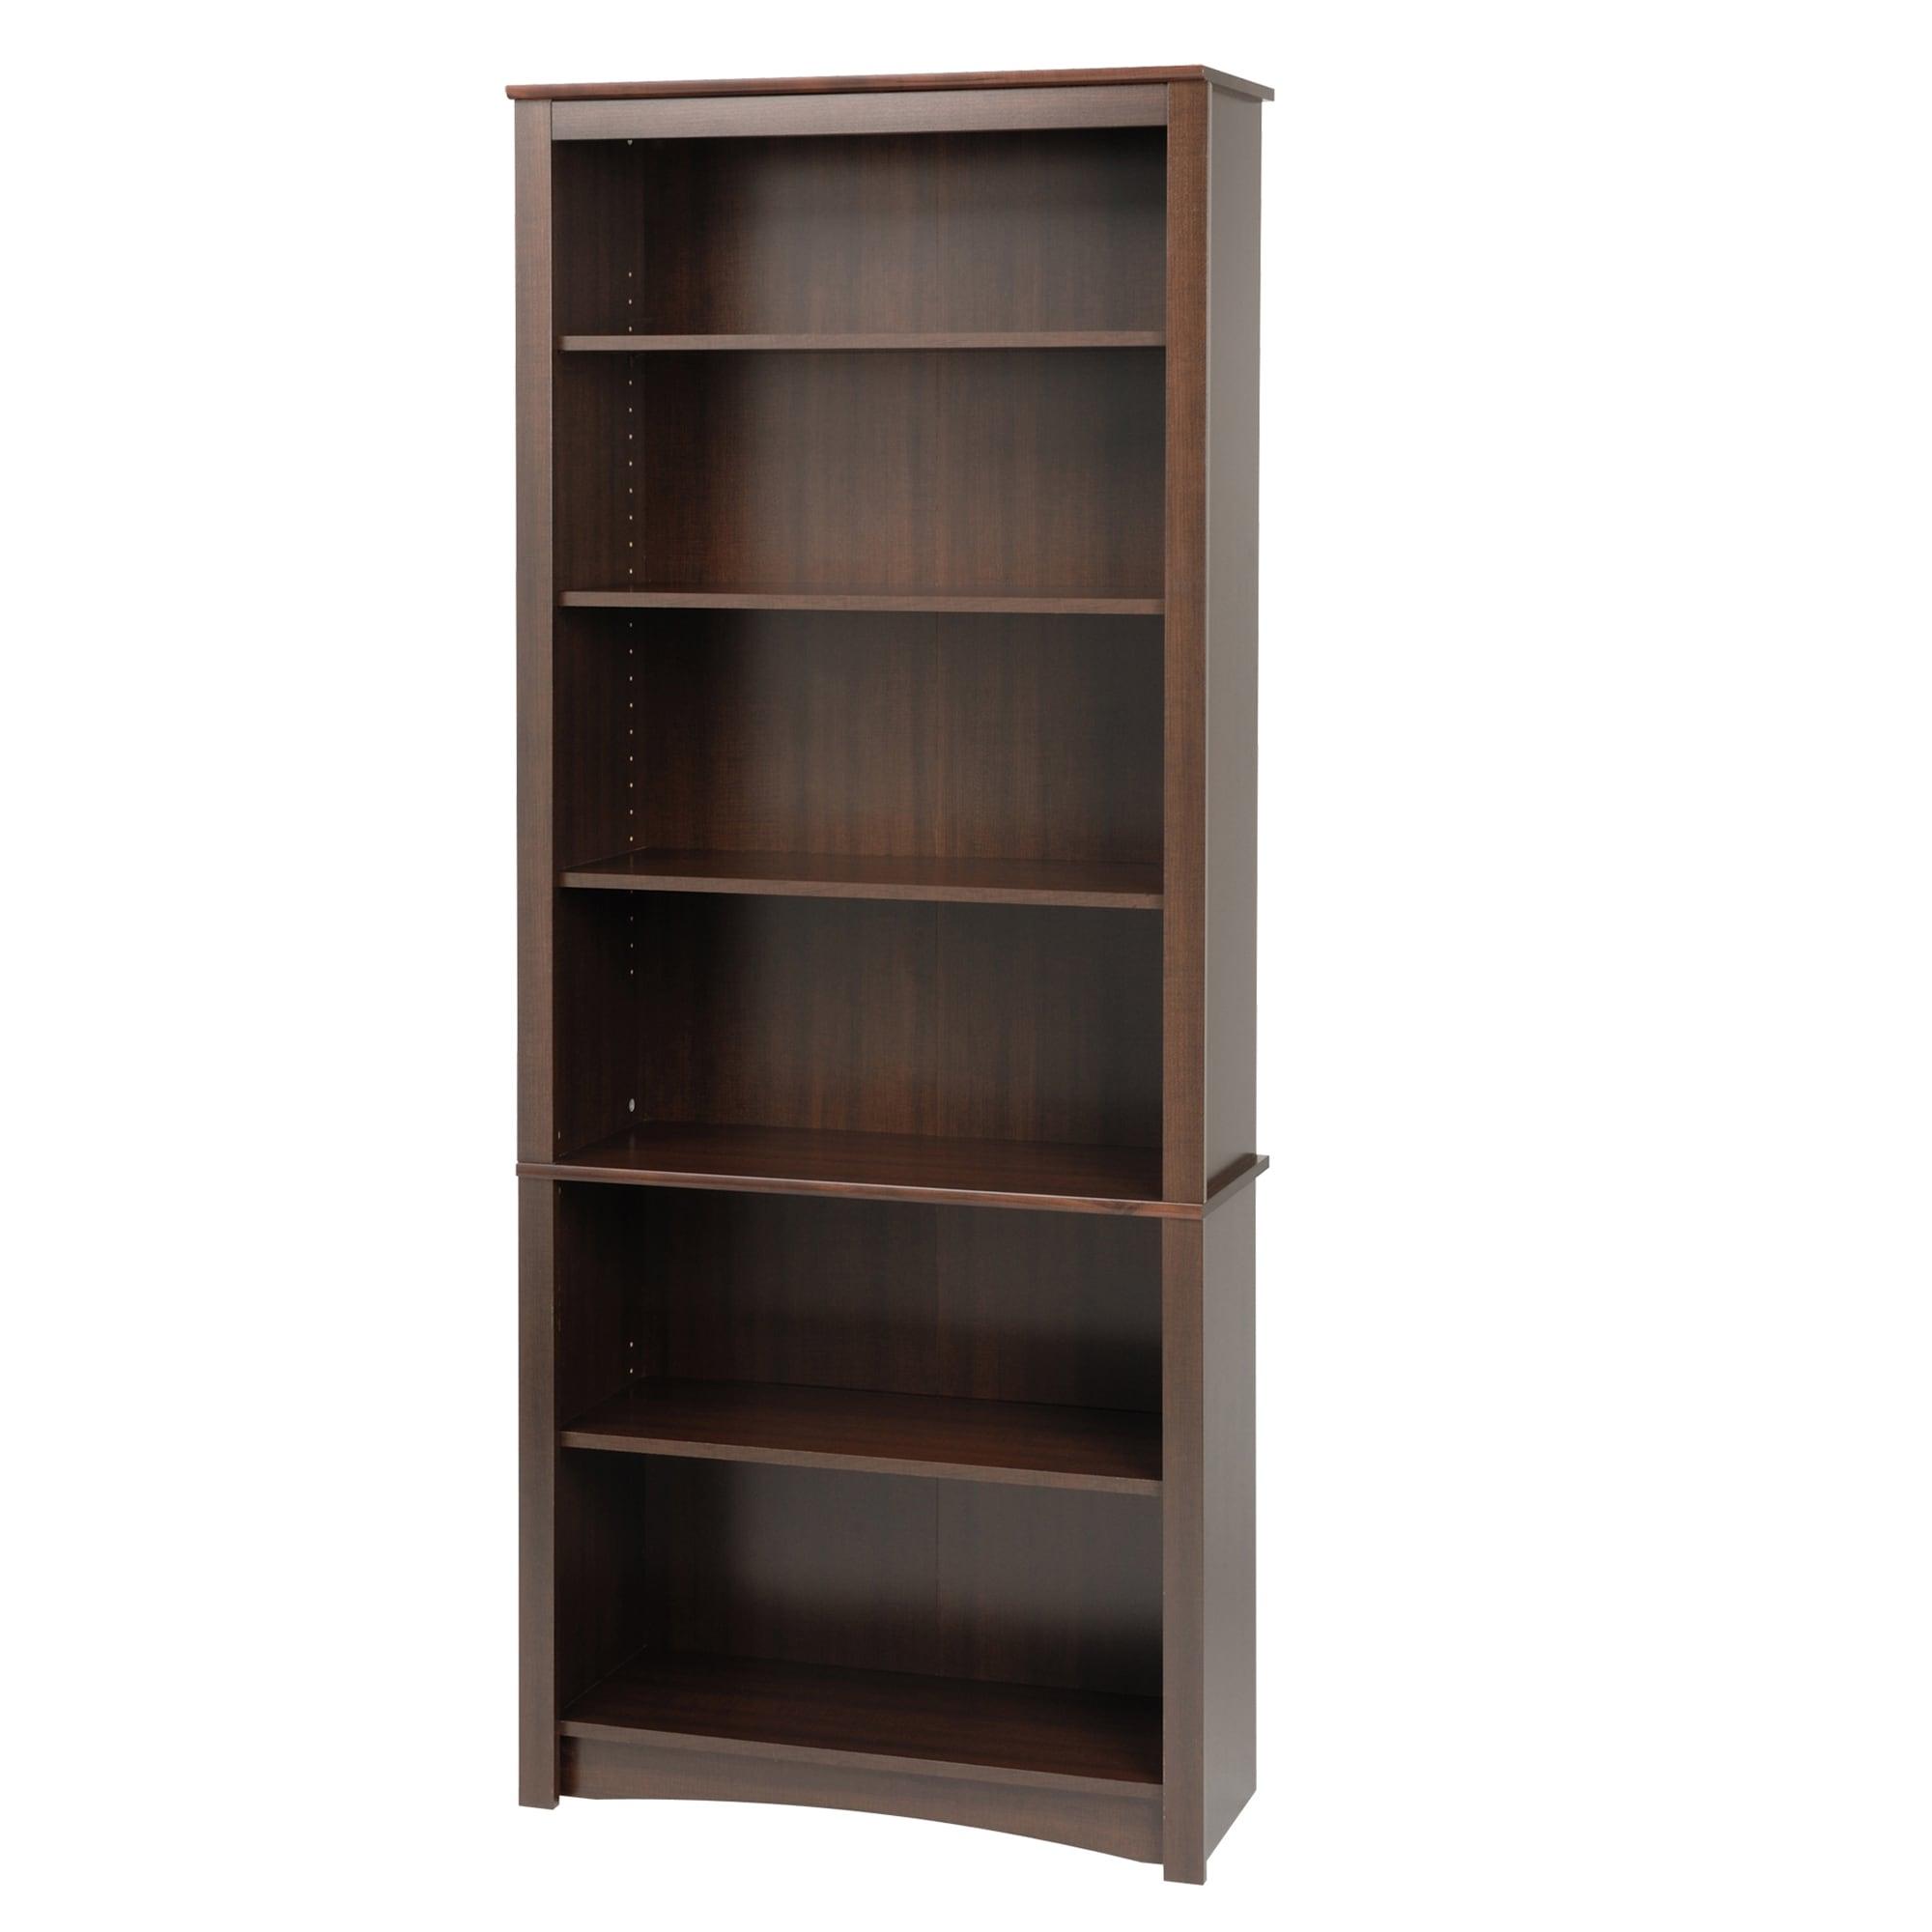 unit id shelf bookcase storage cubby